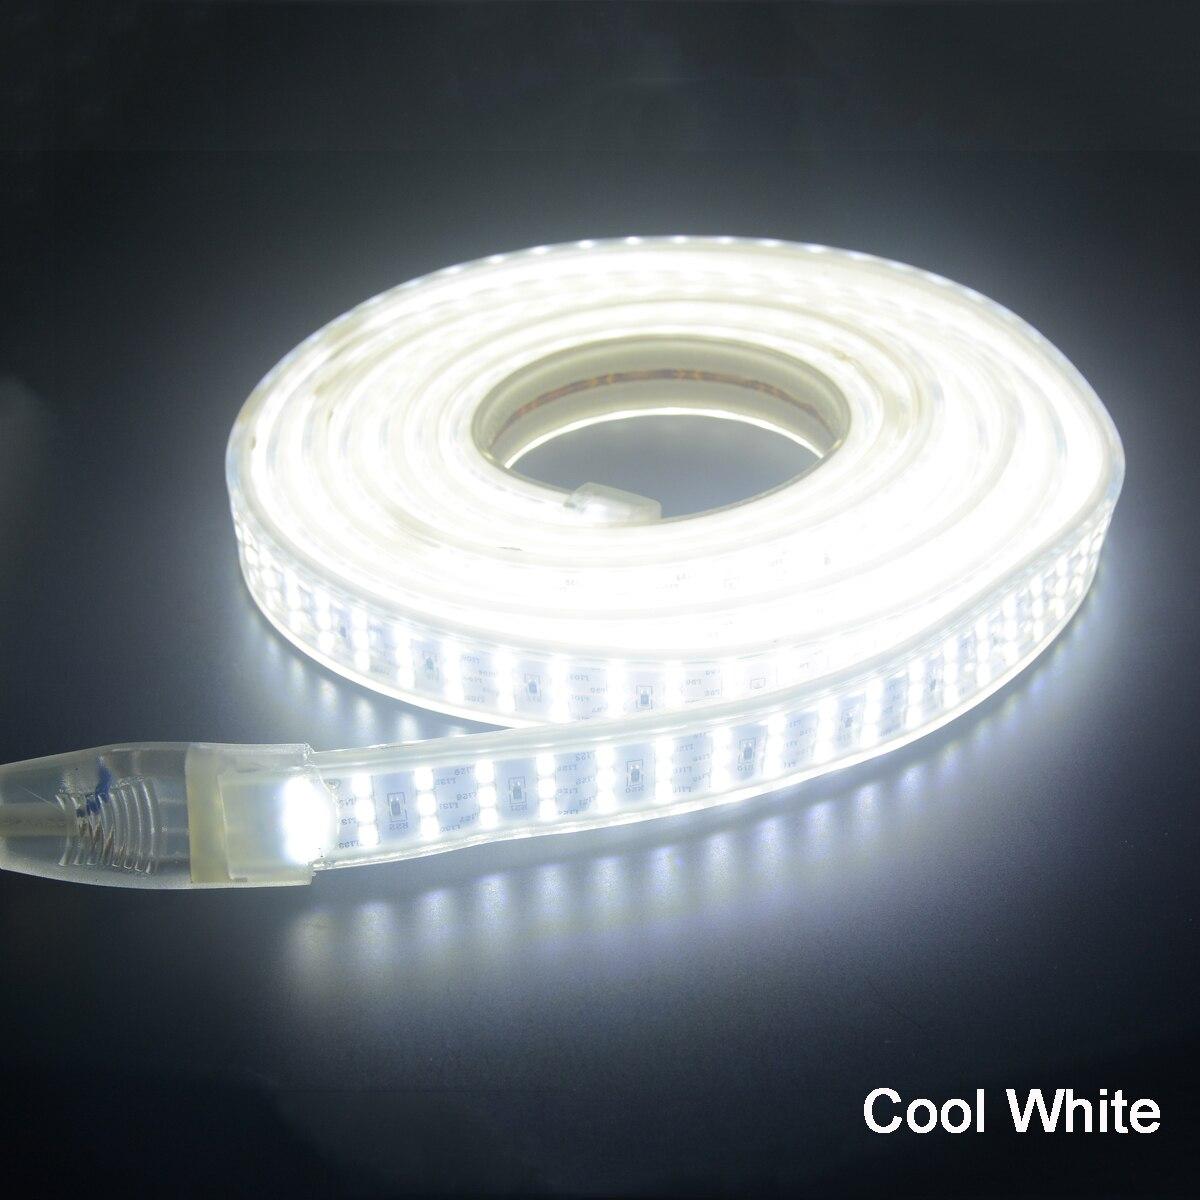 LED Strip 220 V SMD 2835 276 LEDs/M 1 M 2 M 4 M 5 M 6 M 7 M 8 M 9 M + EU Plug